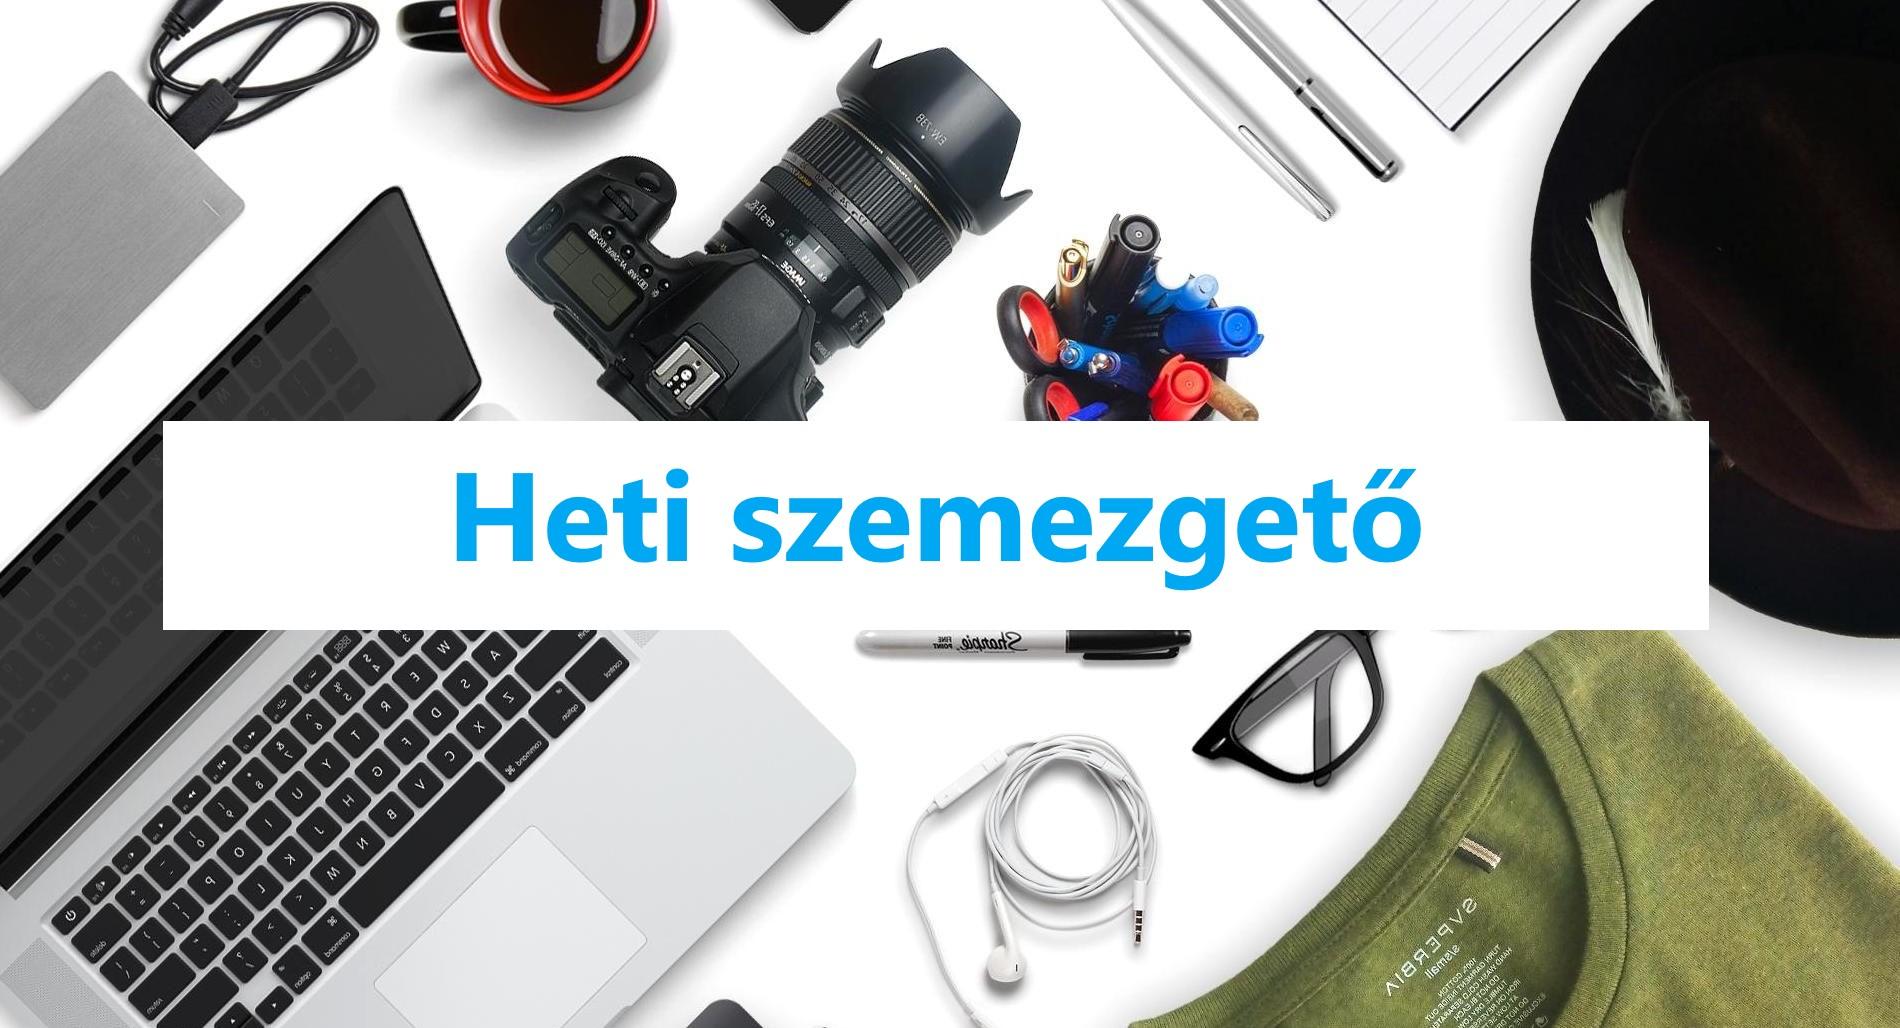 heti_szemezgeto_uj_38.jpg